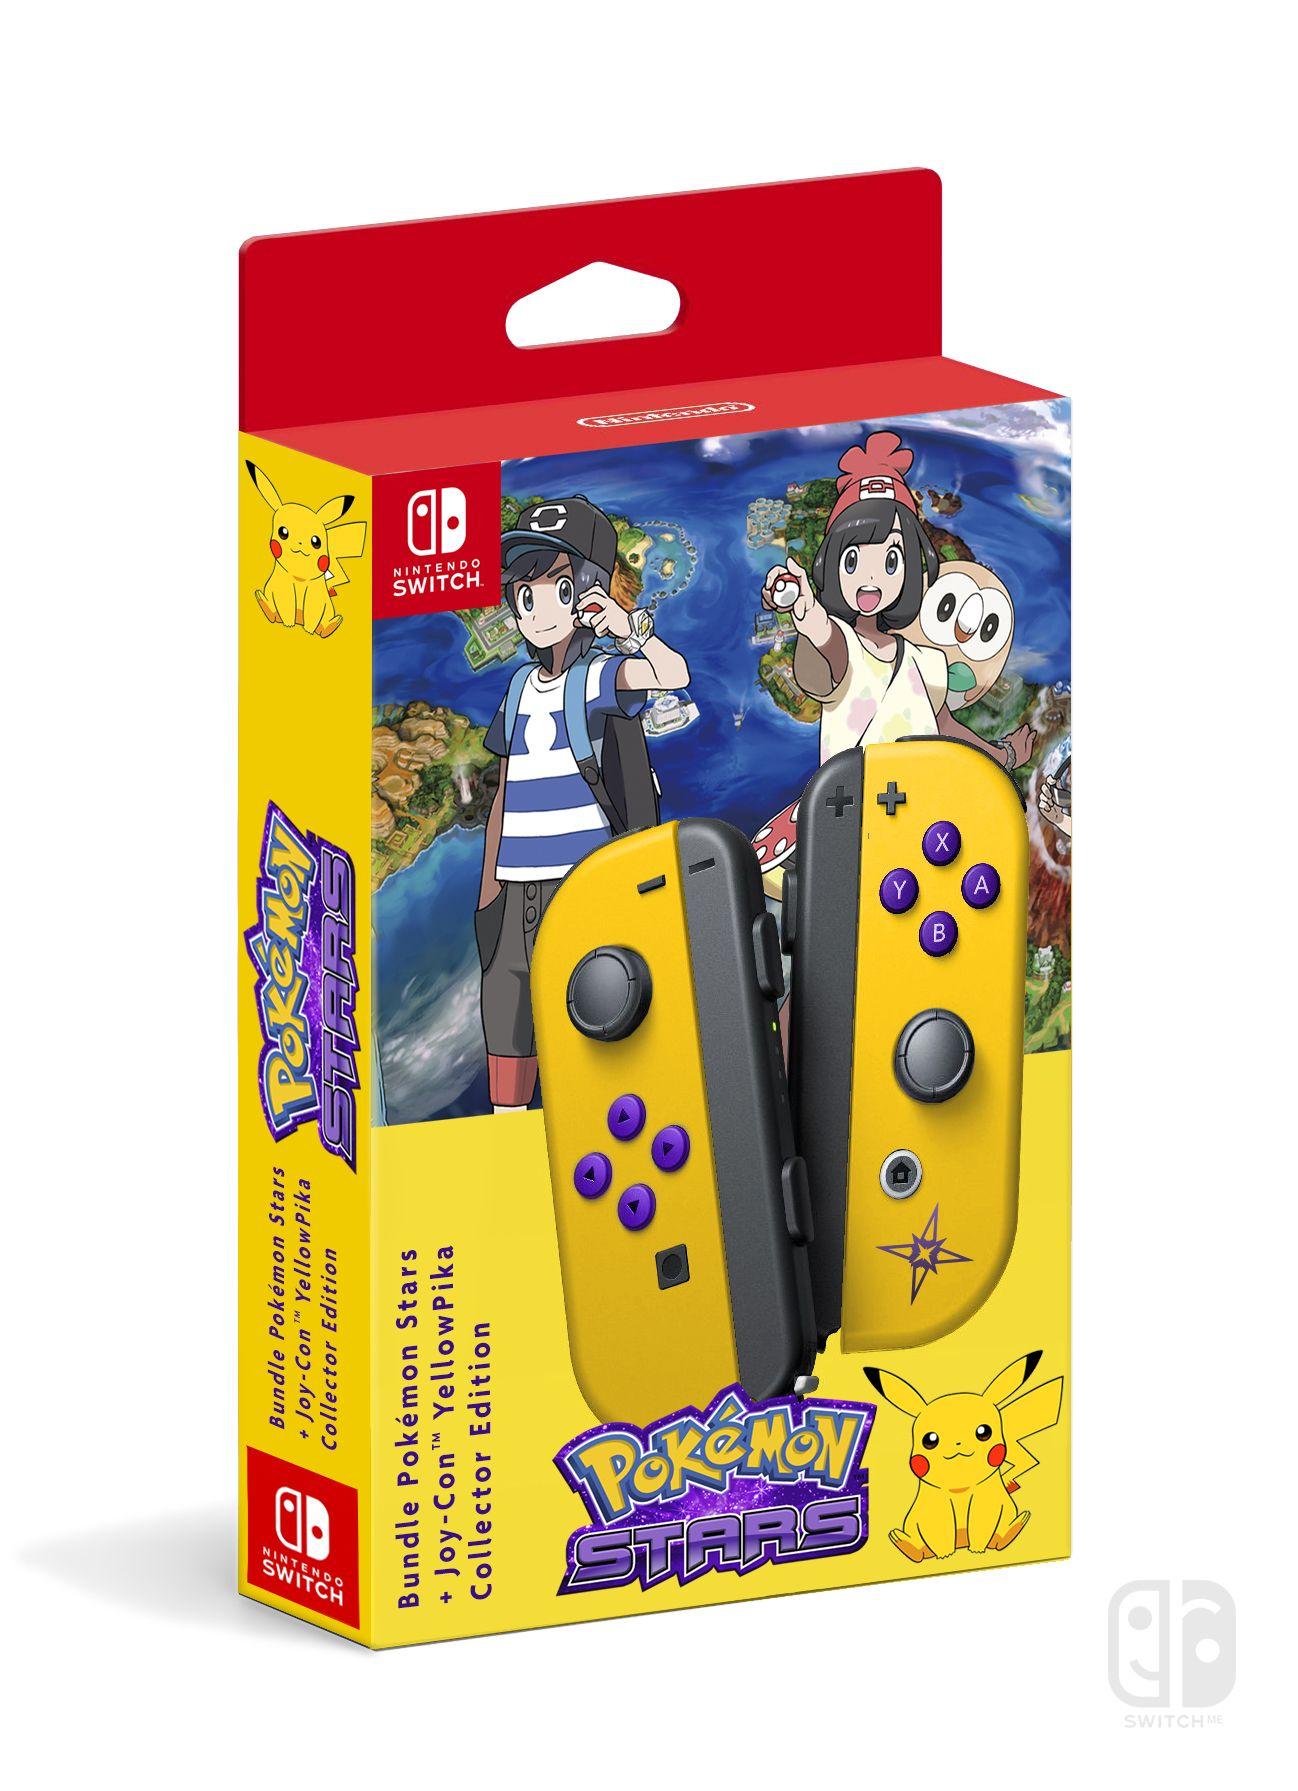 Bundle Pokemon Stars Nintendo Joy Con Collector Nintendo Switch A Switch Me Fan Art If U Like It F Pokemon Star Nintendo Switch Accessories Nintendo Switch